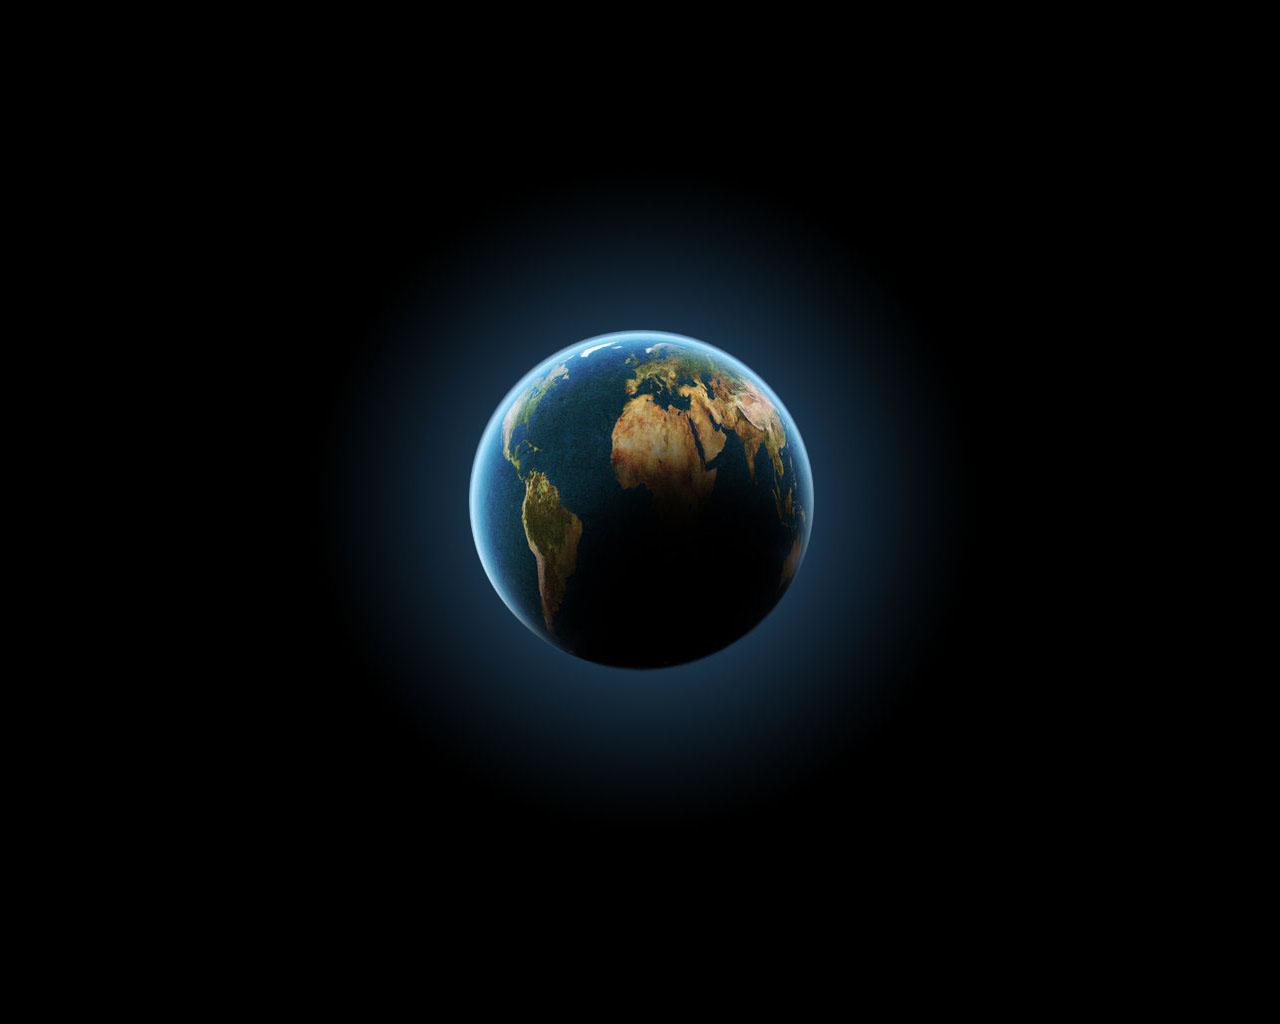 http://3.bp.blogspot.com/-cNb-ojtlTF8/TrQVcRTPOXI/AAAAAAAAAT0/dDMthZeiN94/s1600/Cool_Globe_Wallpaper_by_petgrill.jpg